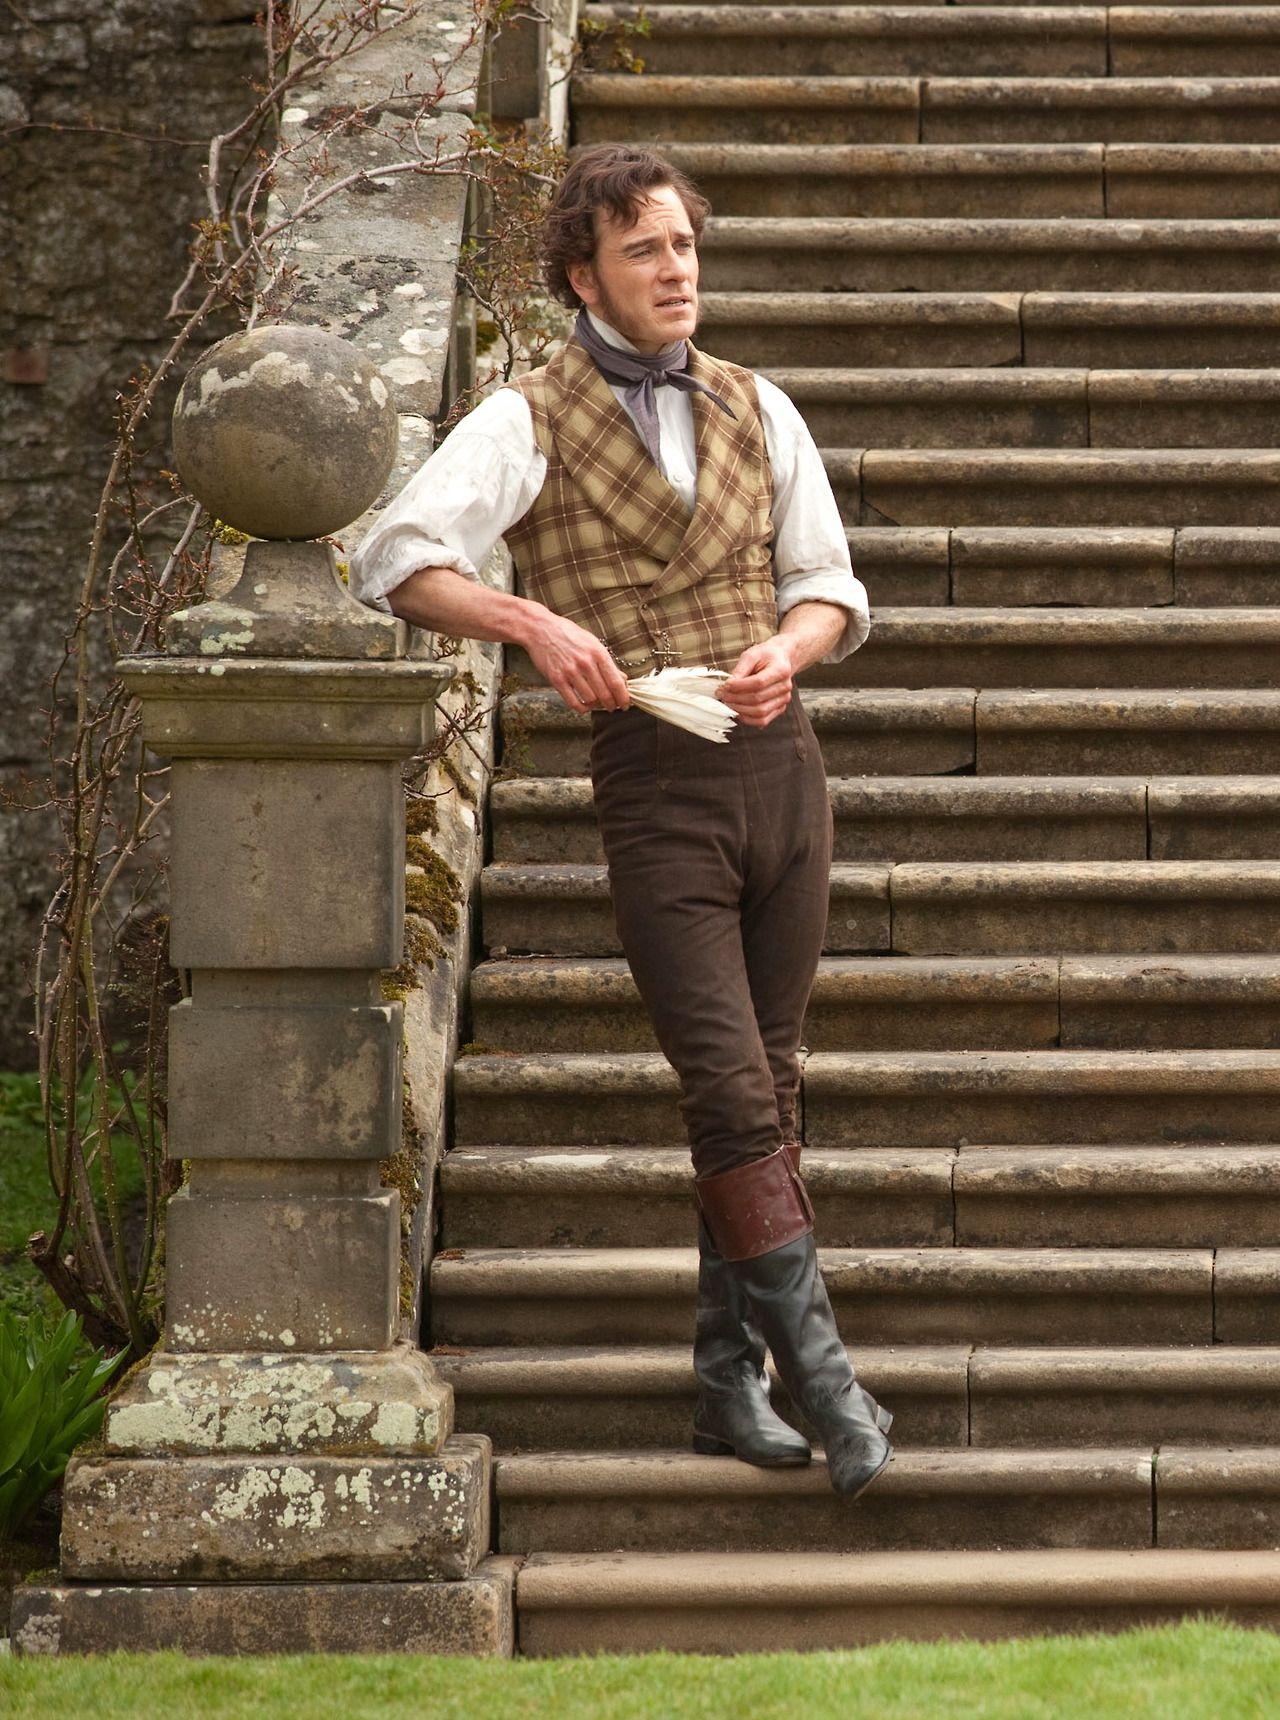 006 Michael Fassbender as Edward Rochester in Jane Eyre (2011